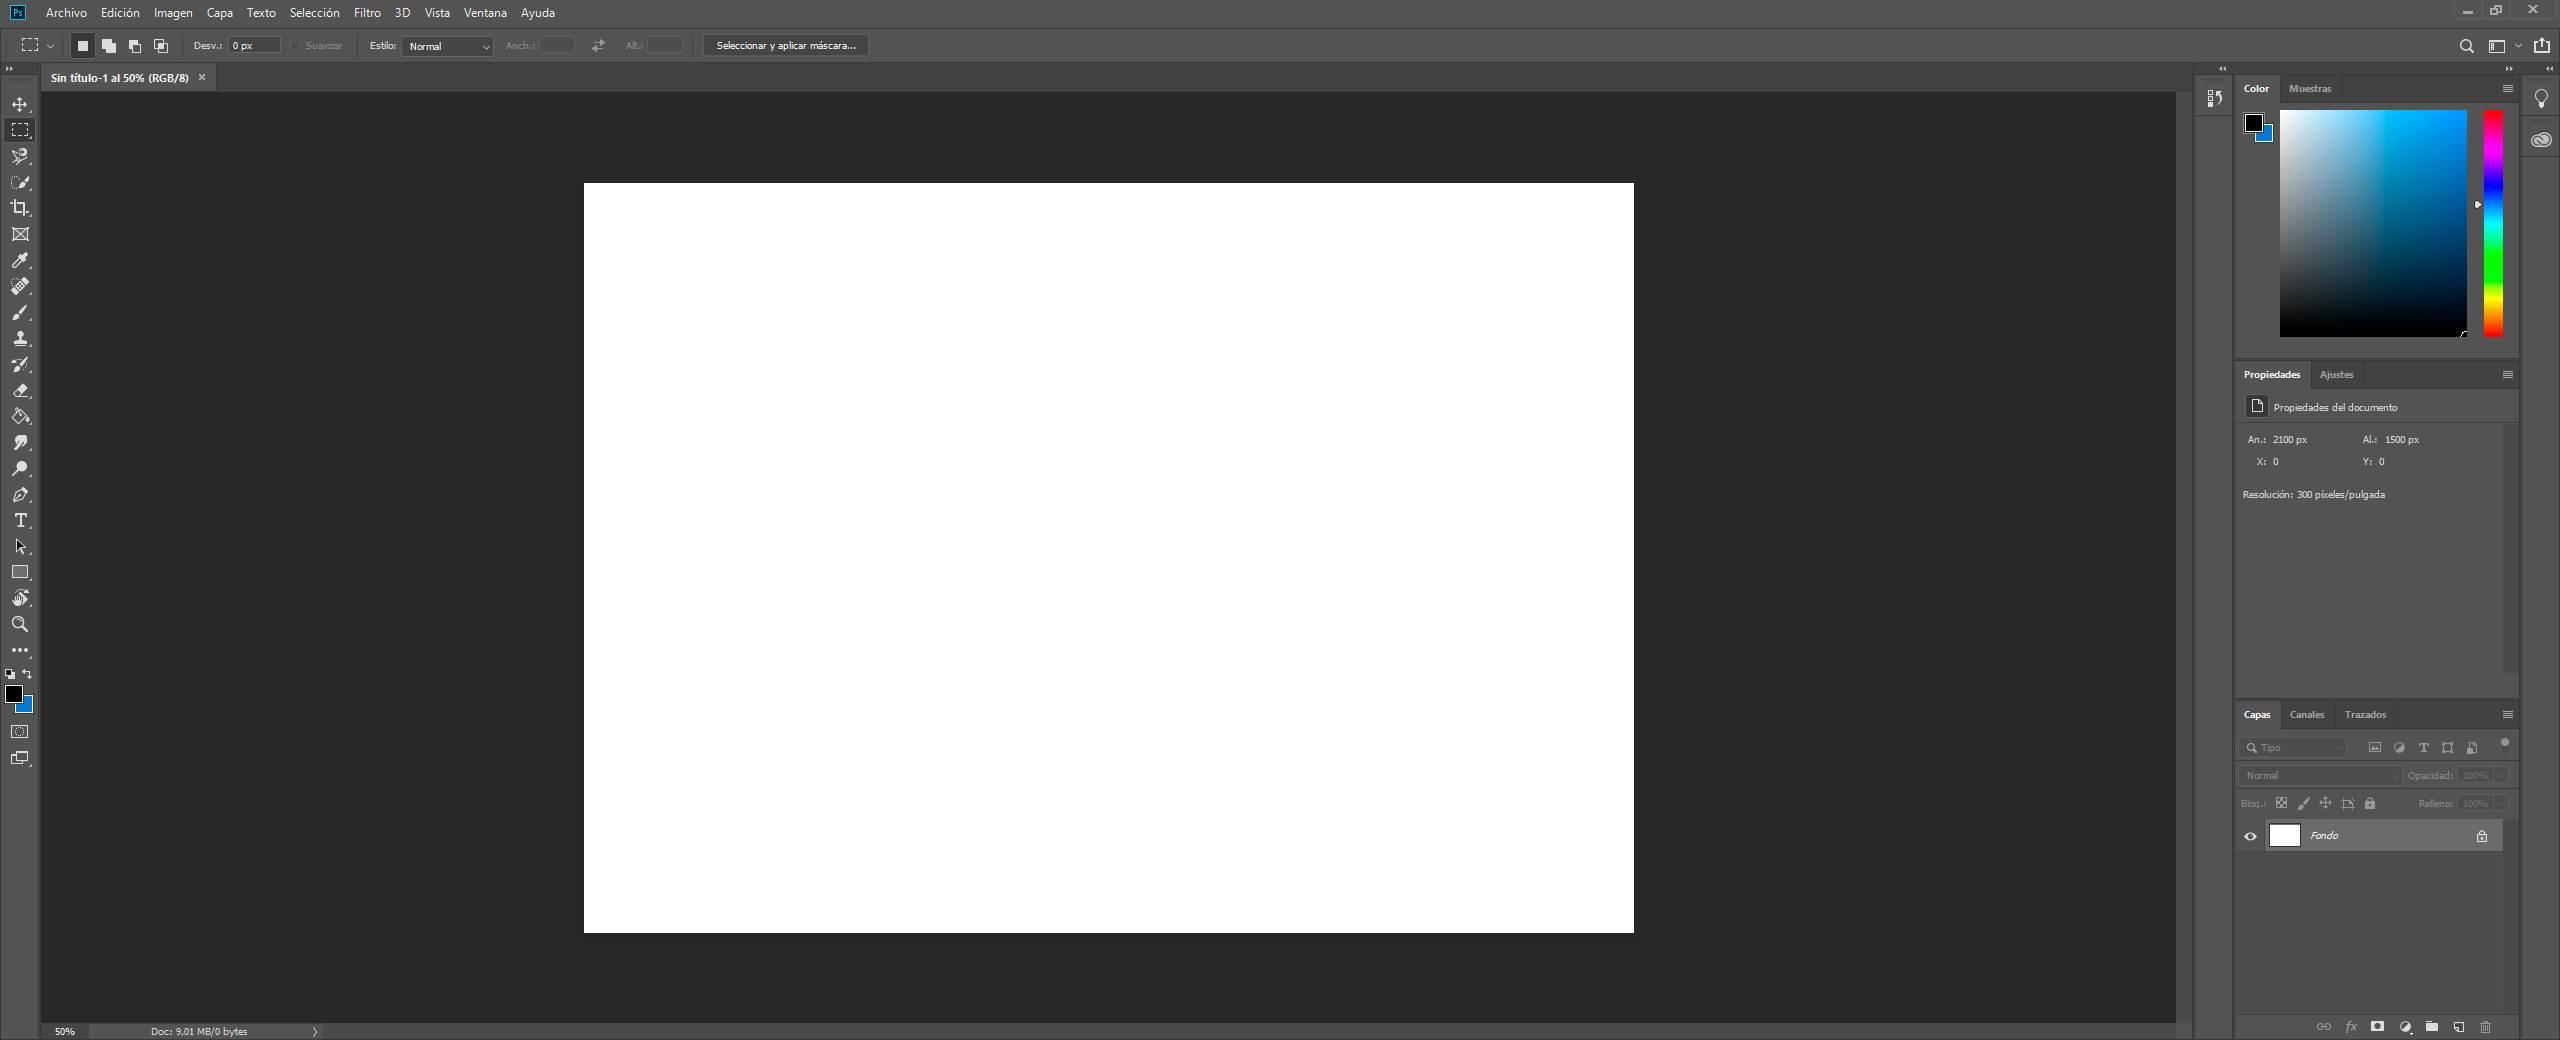 Adobe Photoshop CC - Interfaz principal